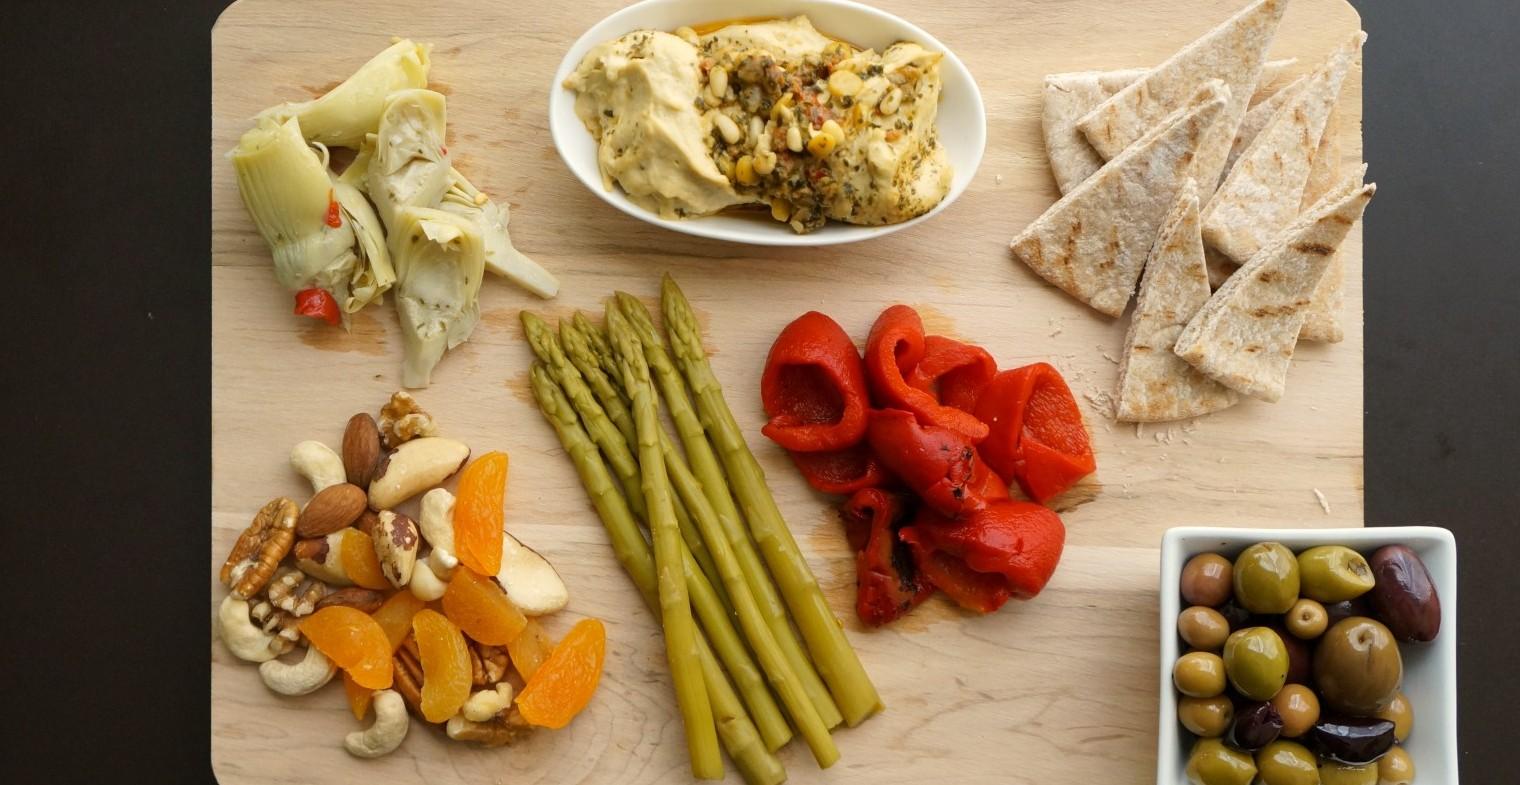 Vegan Mediterranean Snack Board